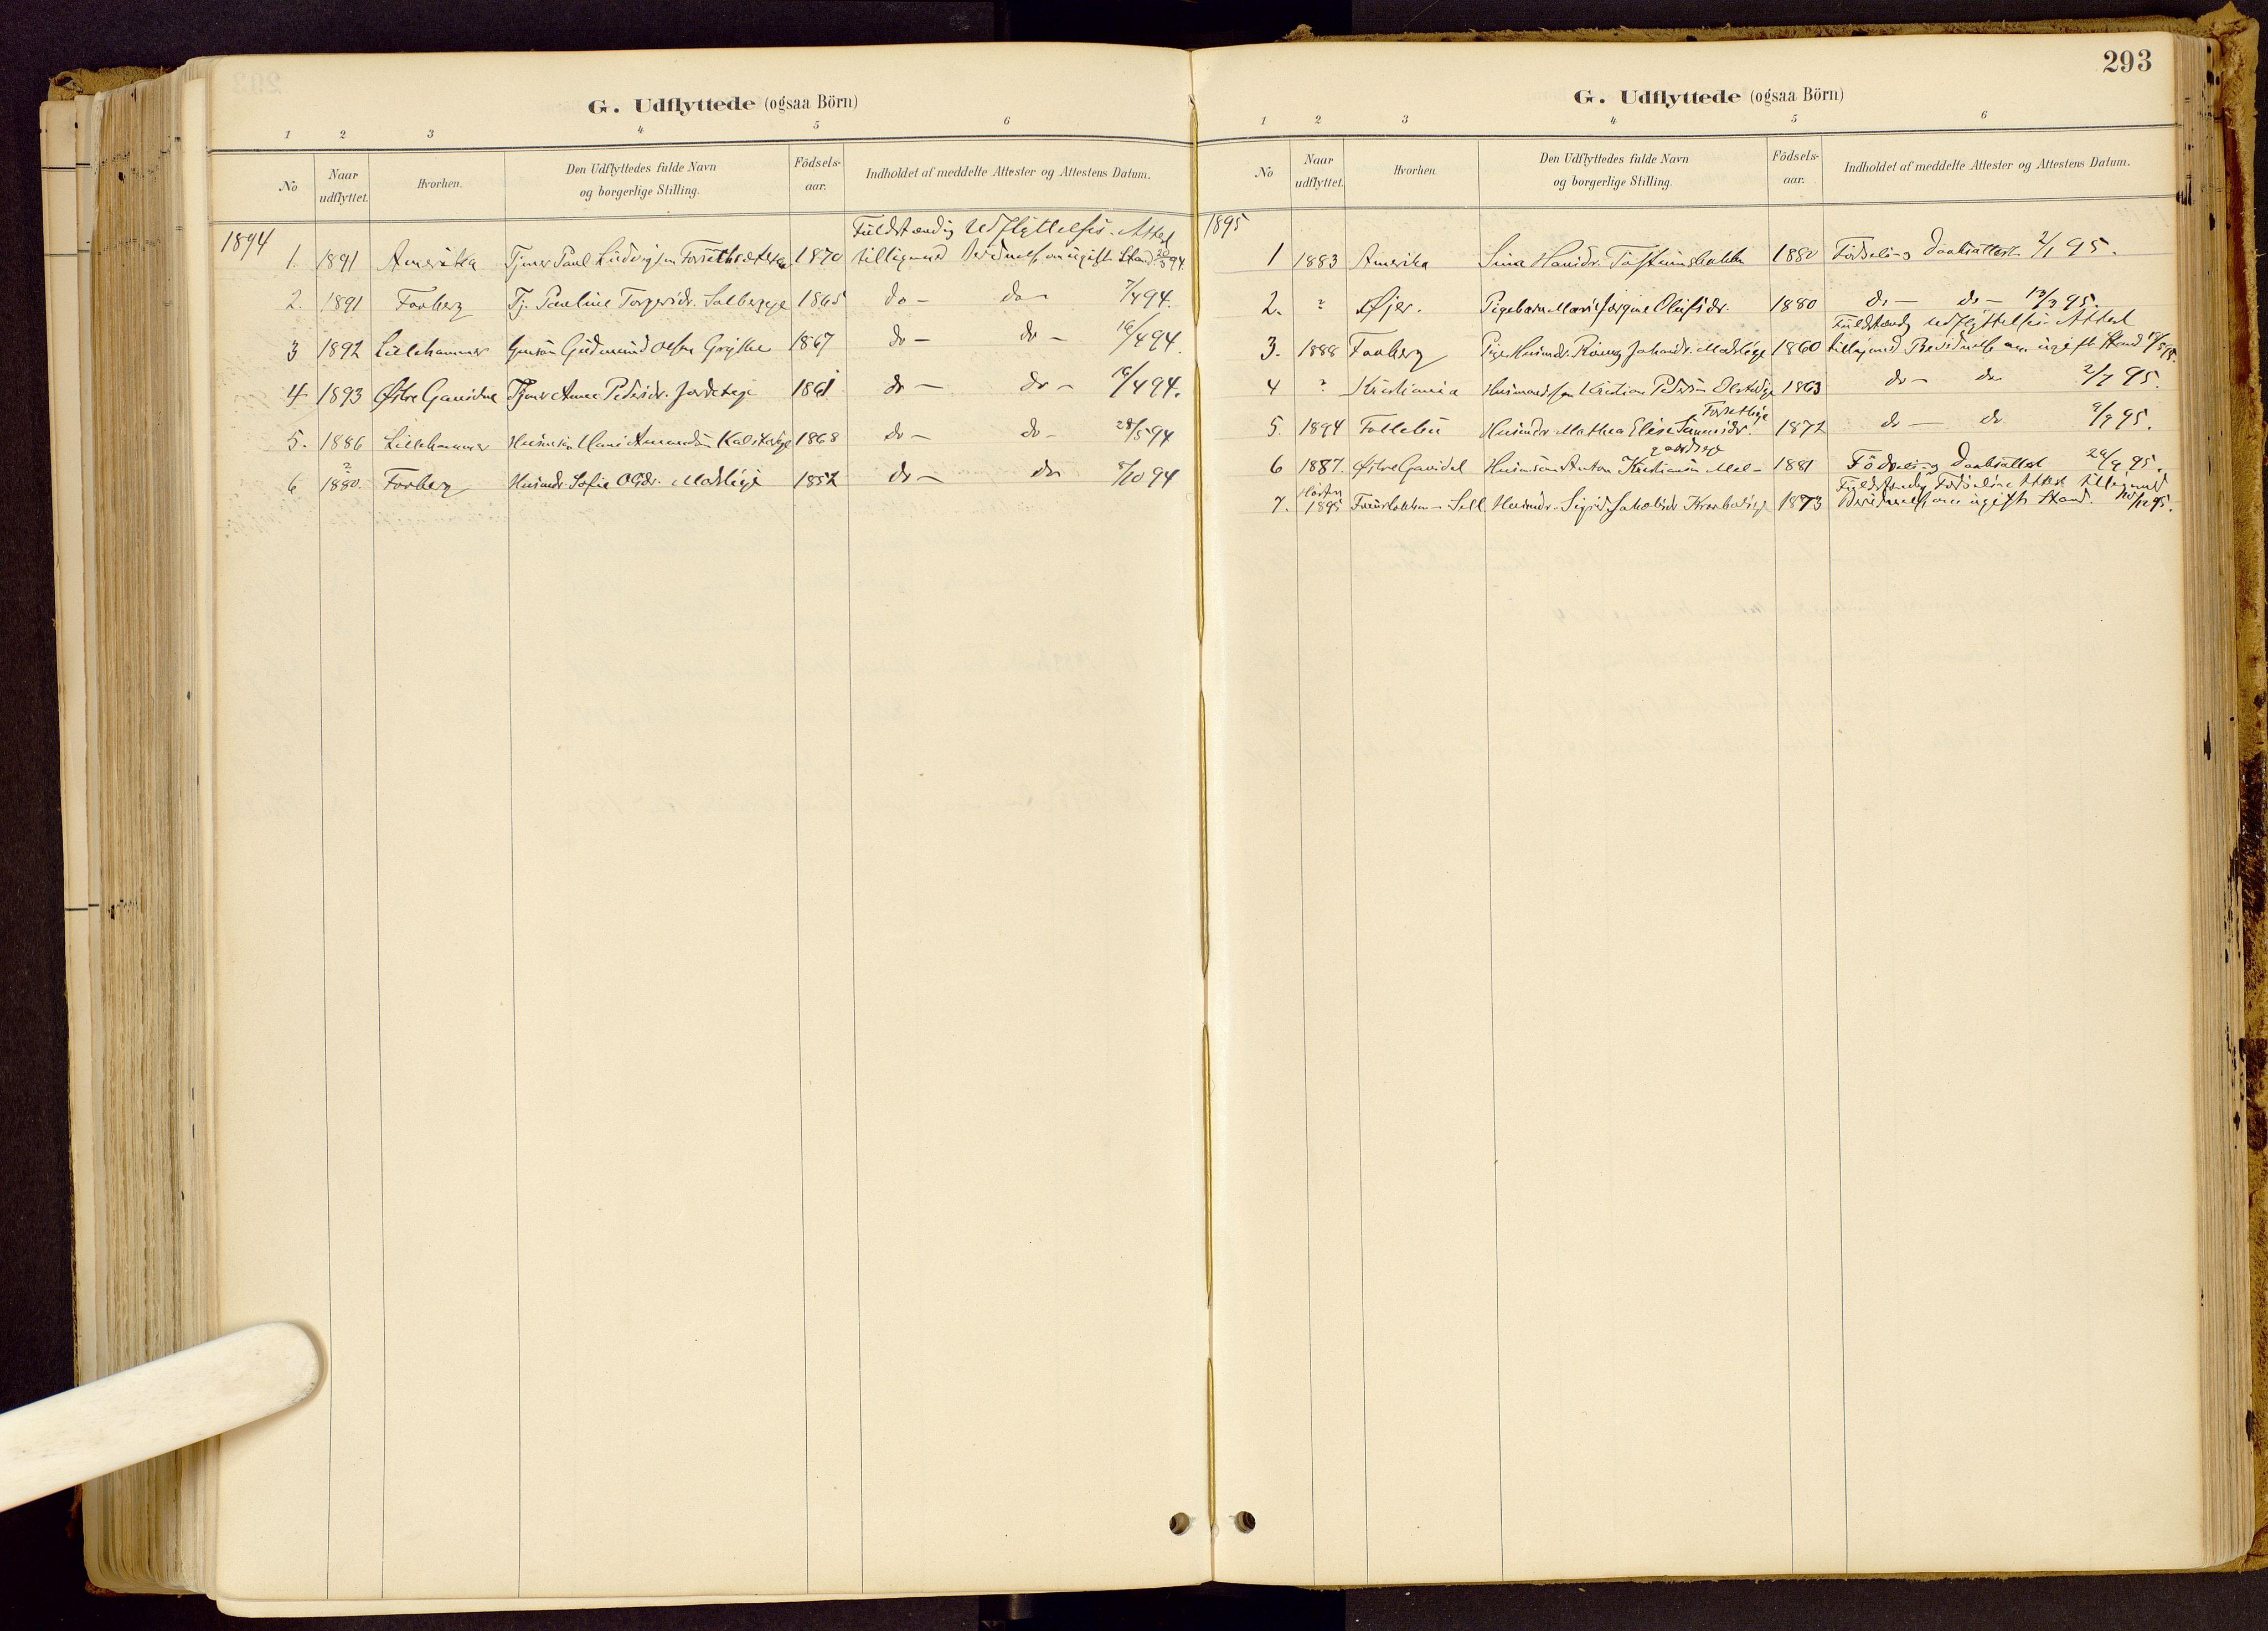 SAH, Vestre Gausdal prestekontor, Ministerialbok nr. 1, 1887-1914, s. 293